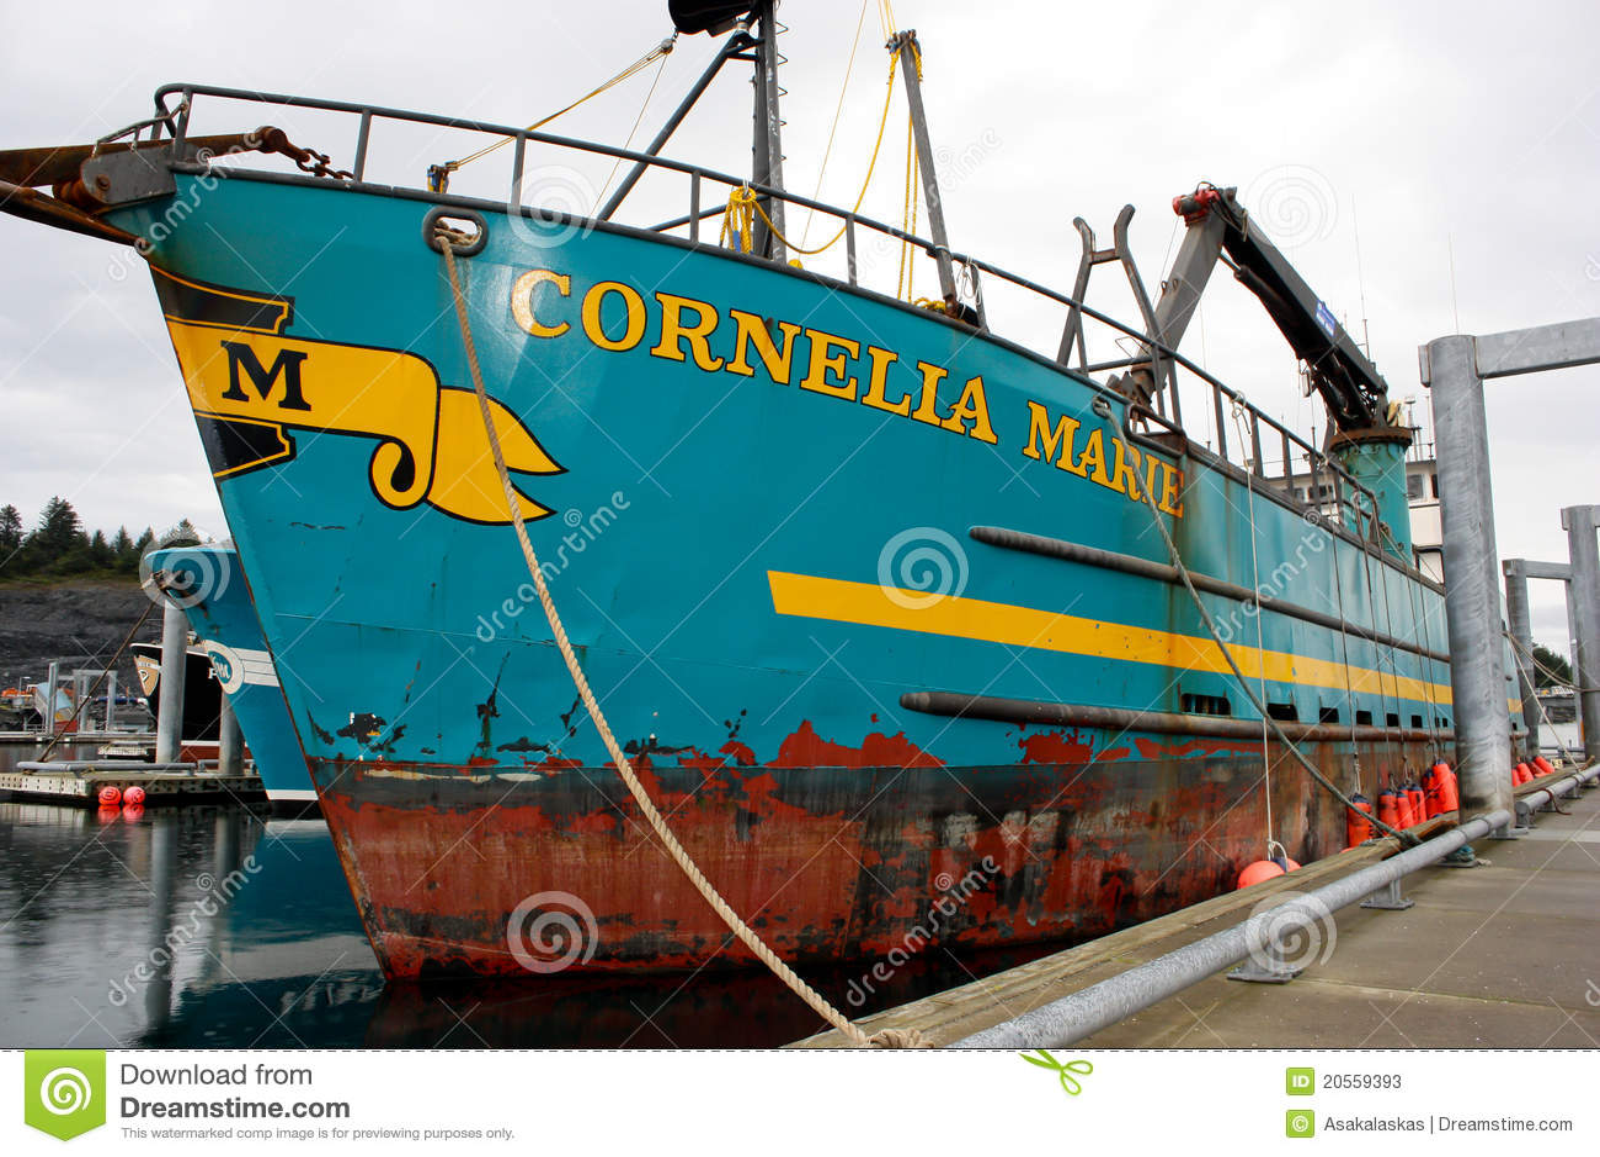 Deadliest Catch Cornelia Marie Boat